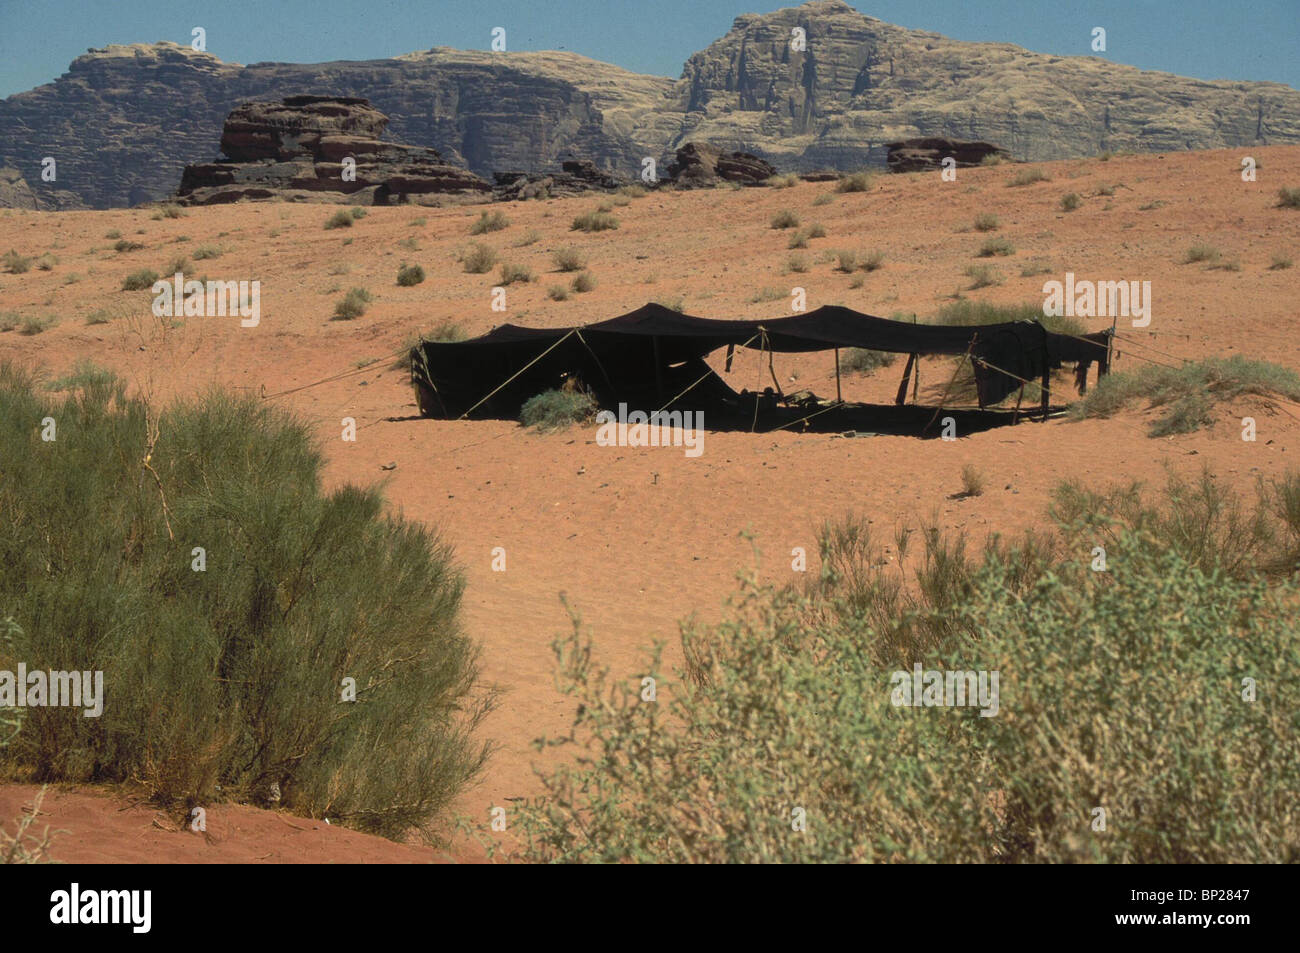 1811. BEDUIN TENTS IN THE DESERT OF WADI RAM IN WESTERN JORDAN NEAR AQABA - Stock Image